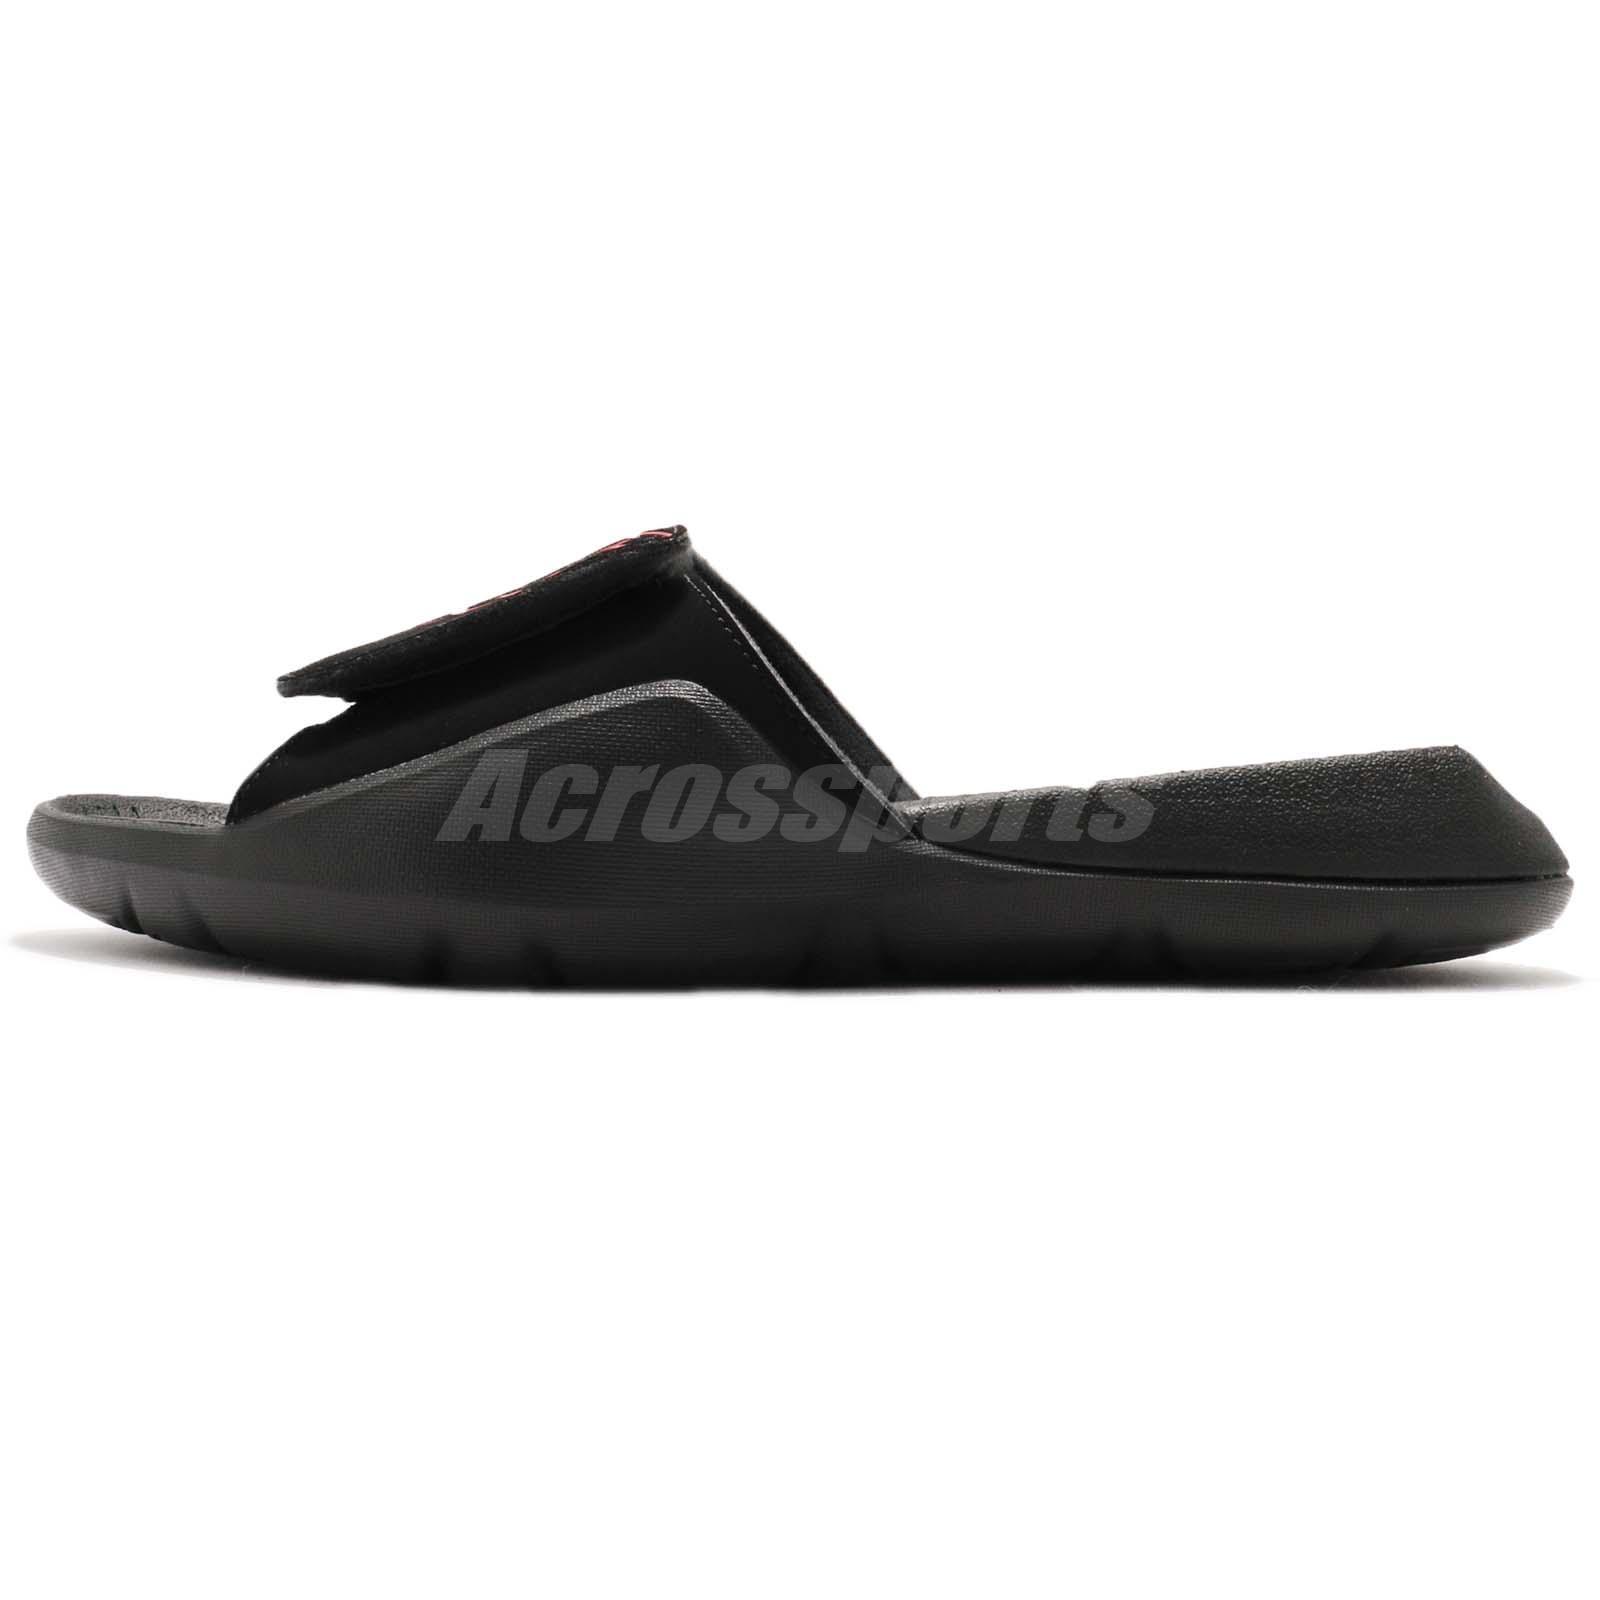 ceea946b2810 Nike Jordan Hydro 7 VII Black Red Men Sports Sandals Slides Slippers ...